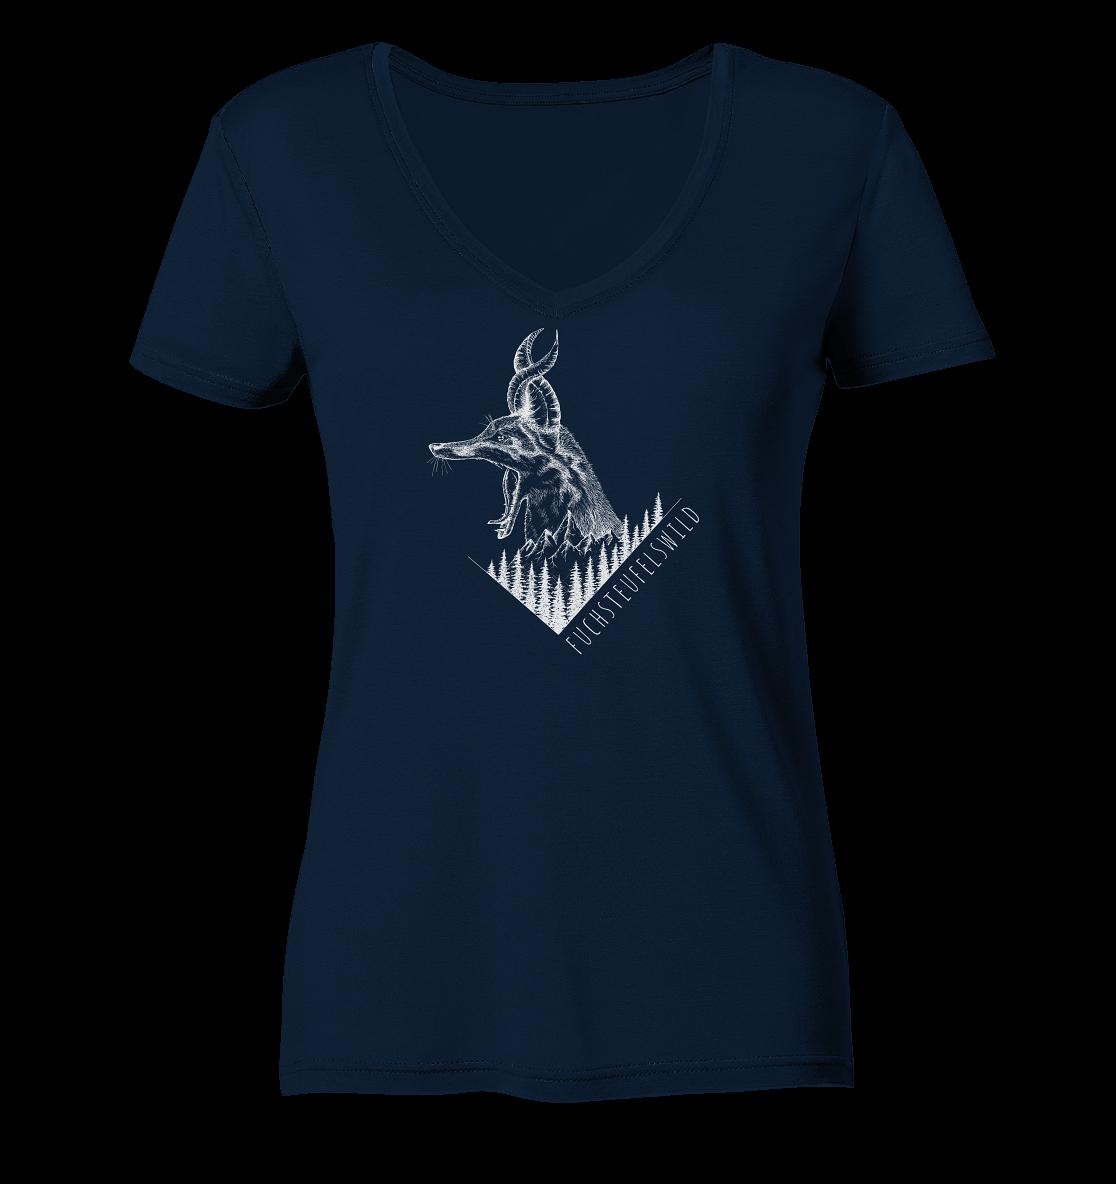 front-ladies-organic-v-neck-shirt-0e2035-1116x-11.png